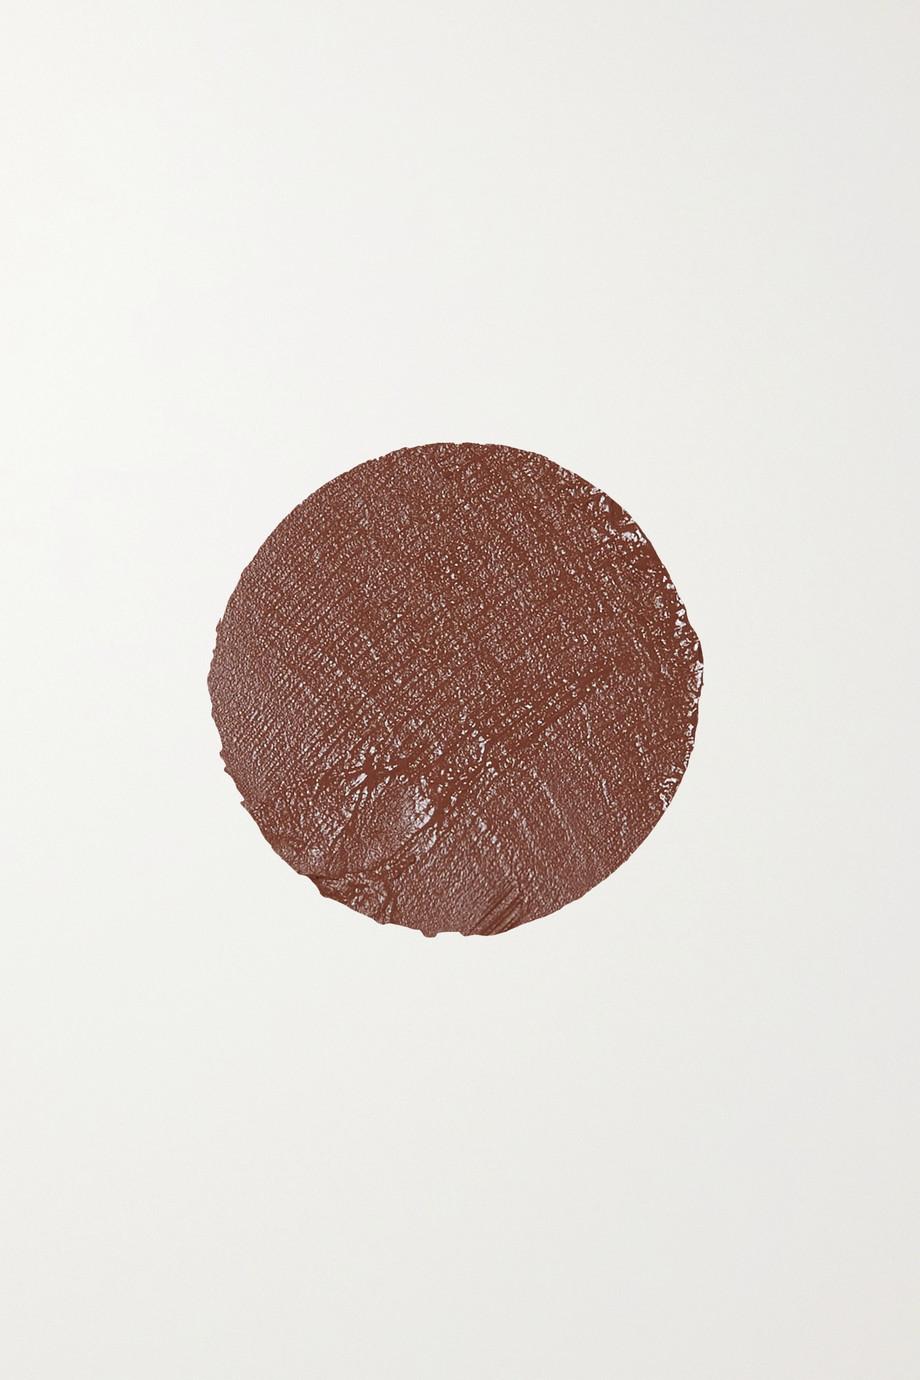 Huda Beauty Power Bullet Cream Glow Lipstick - Goal Digger